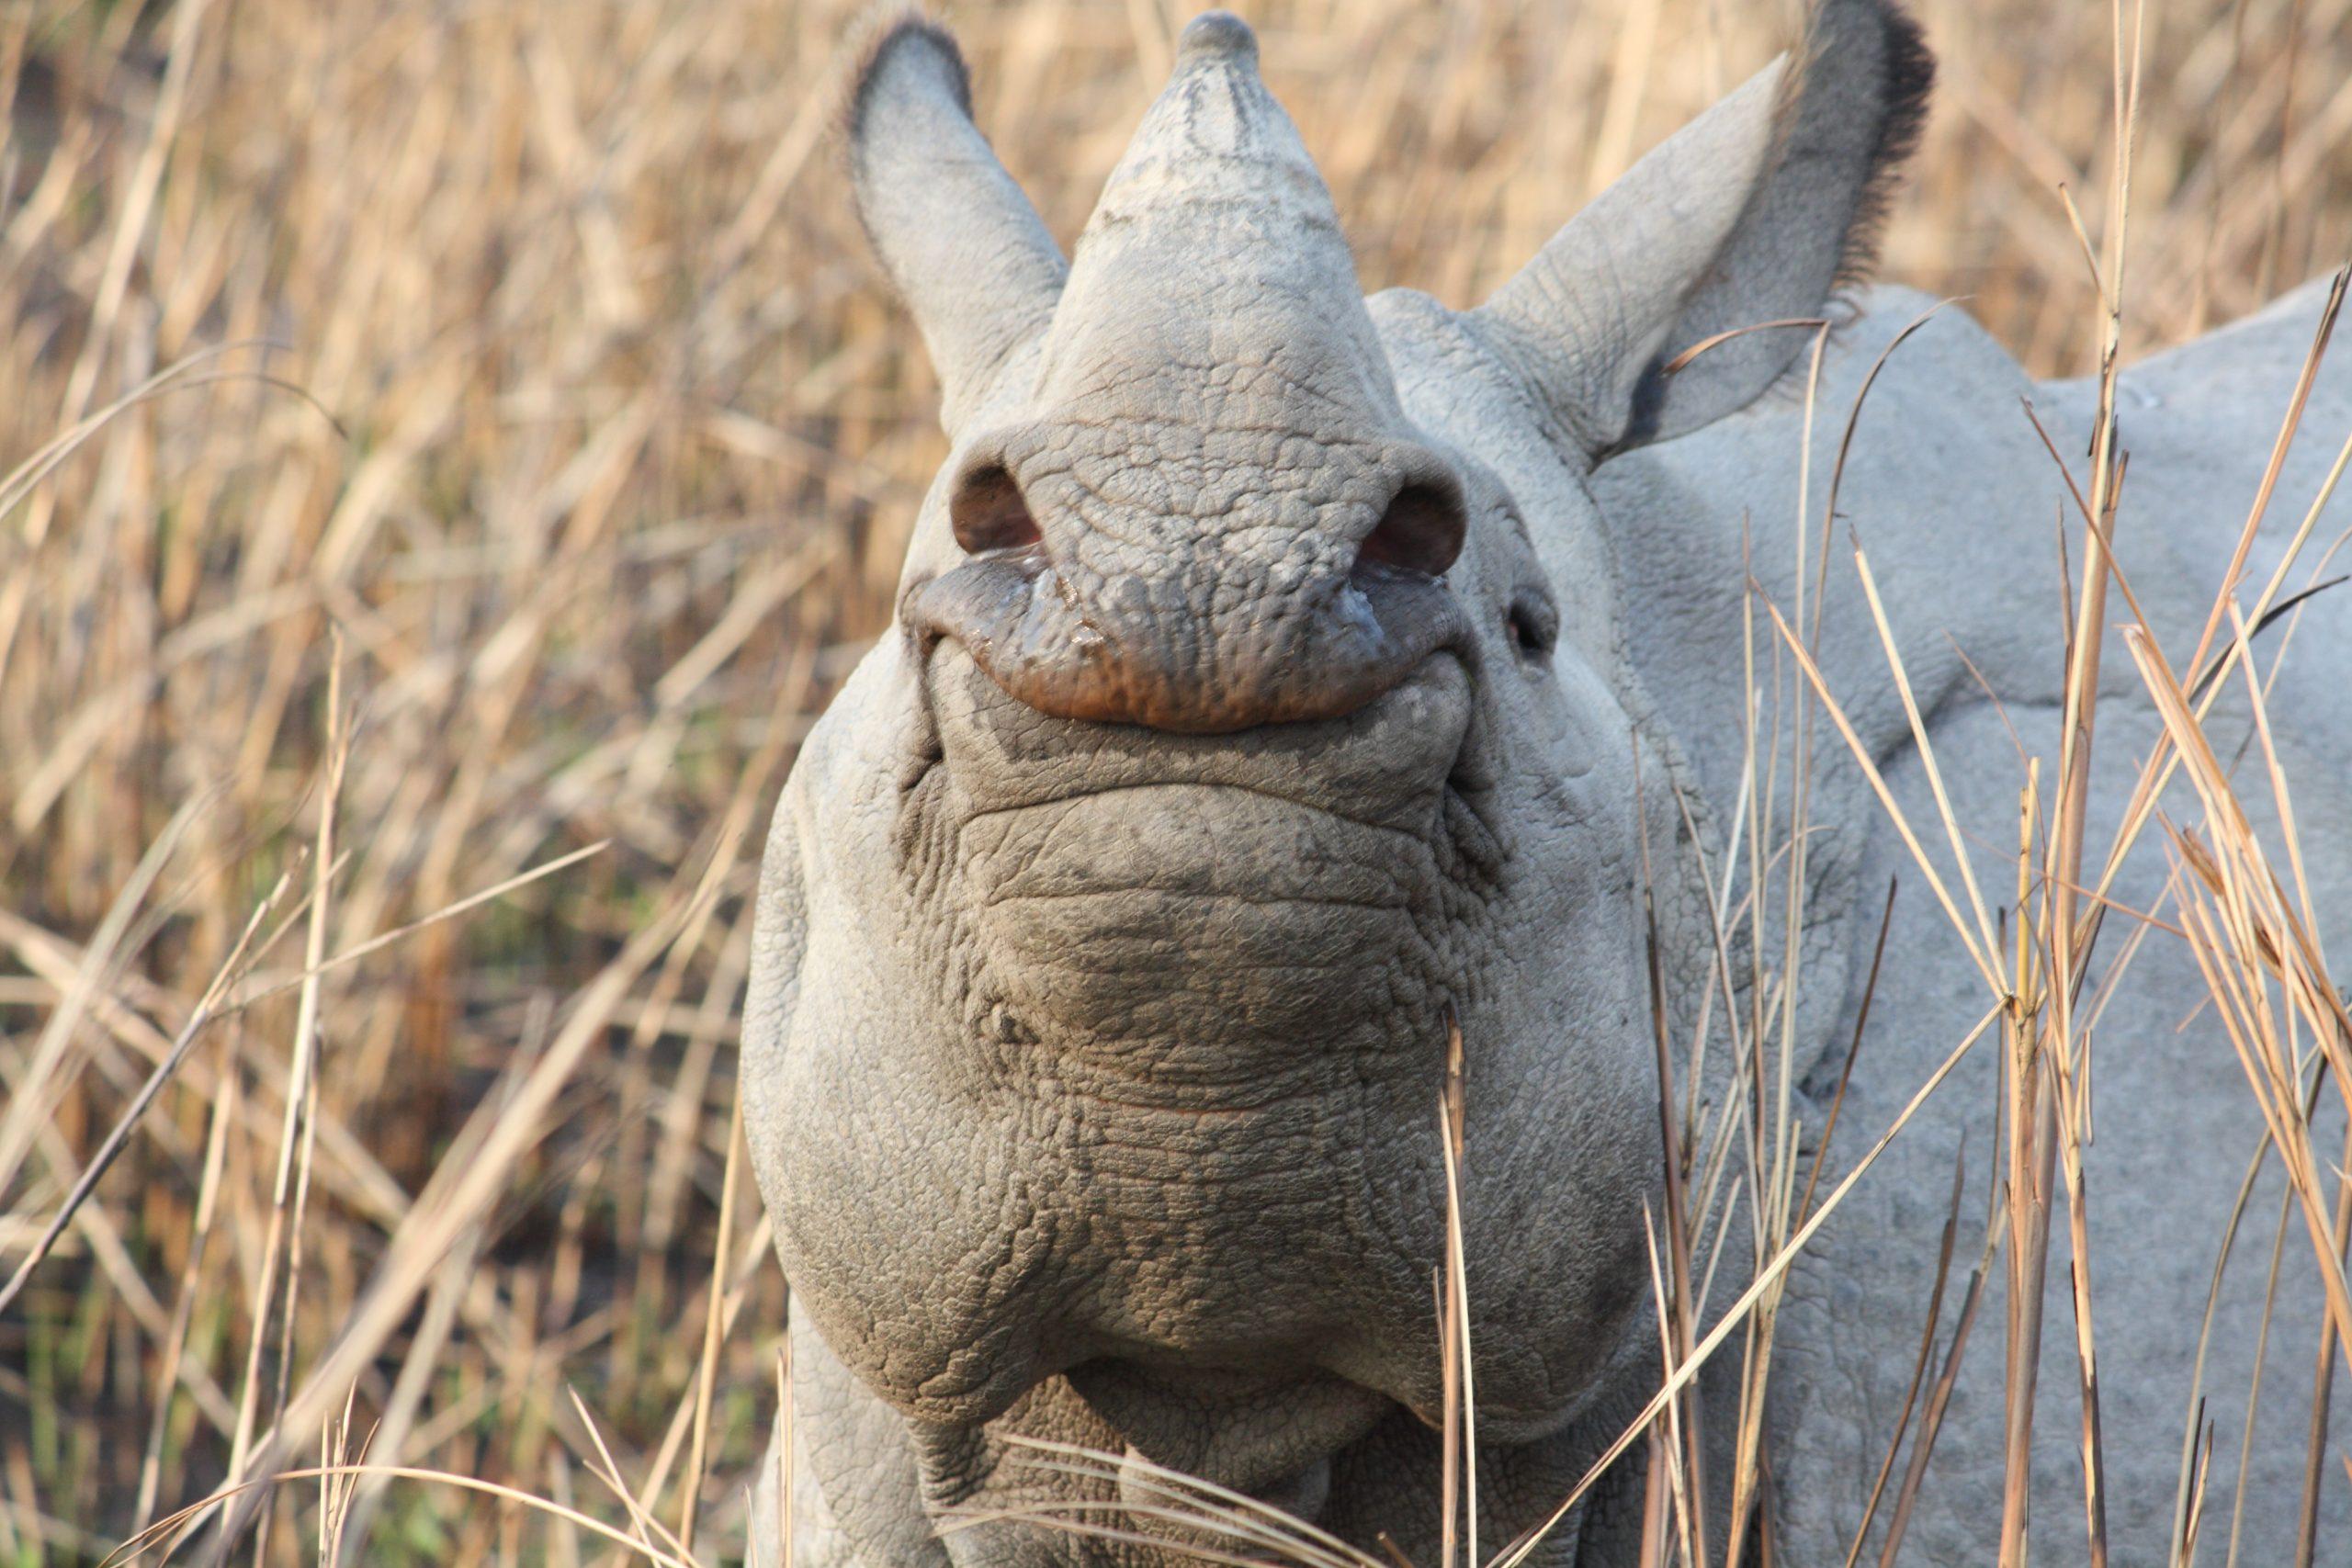 closeup of a rhino